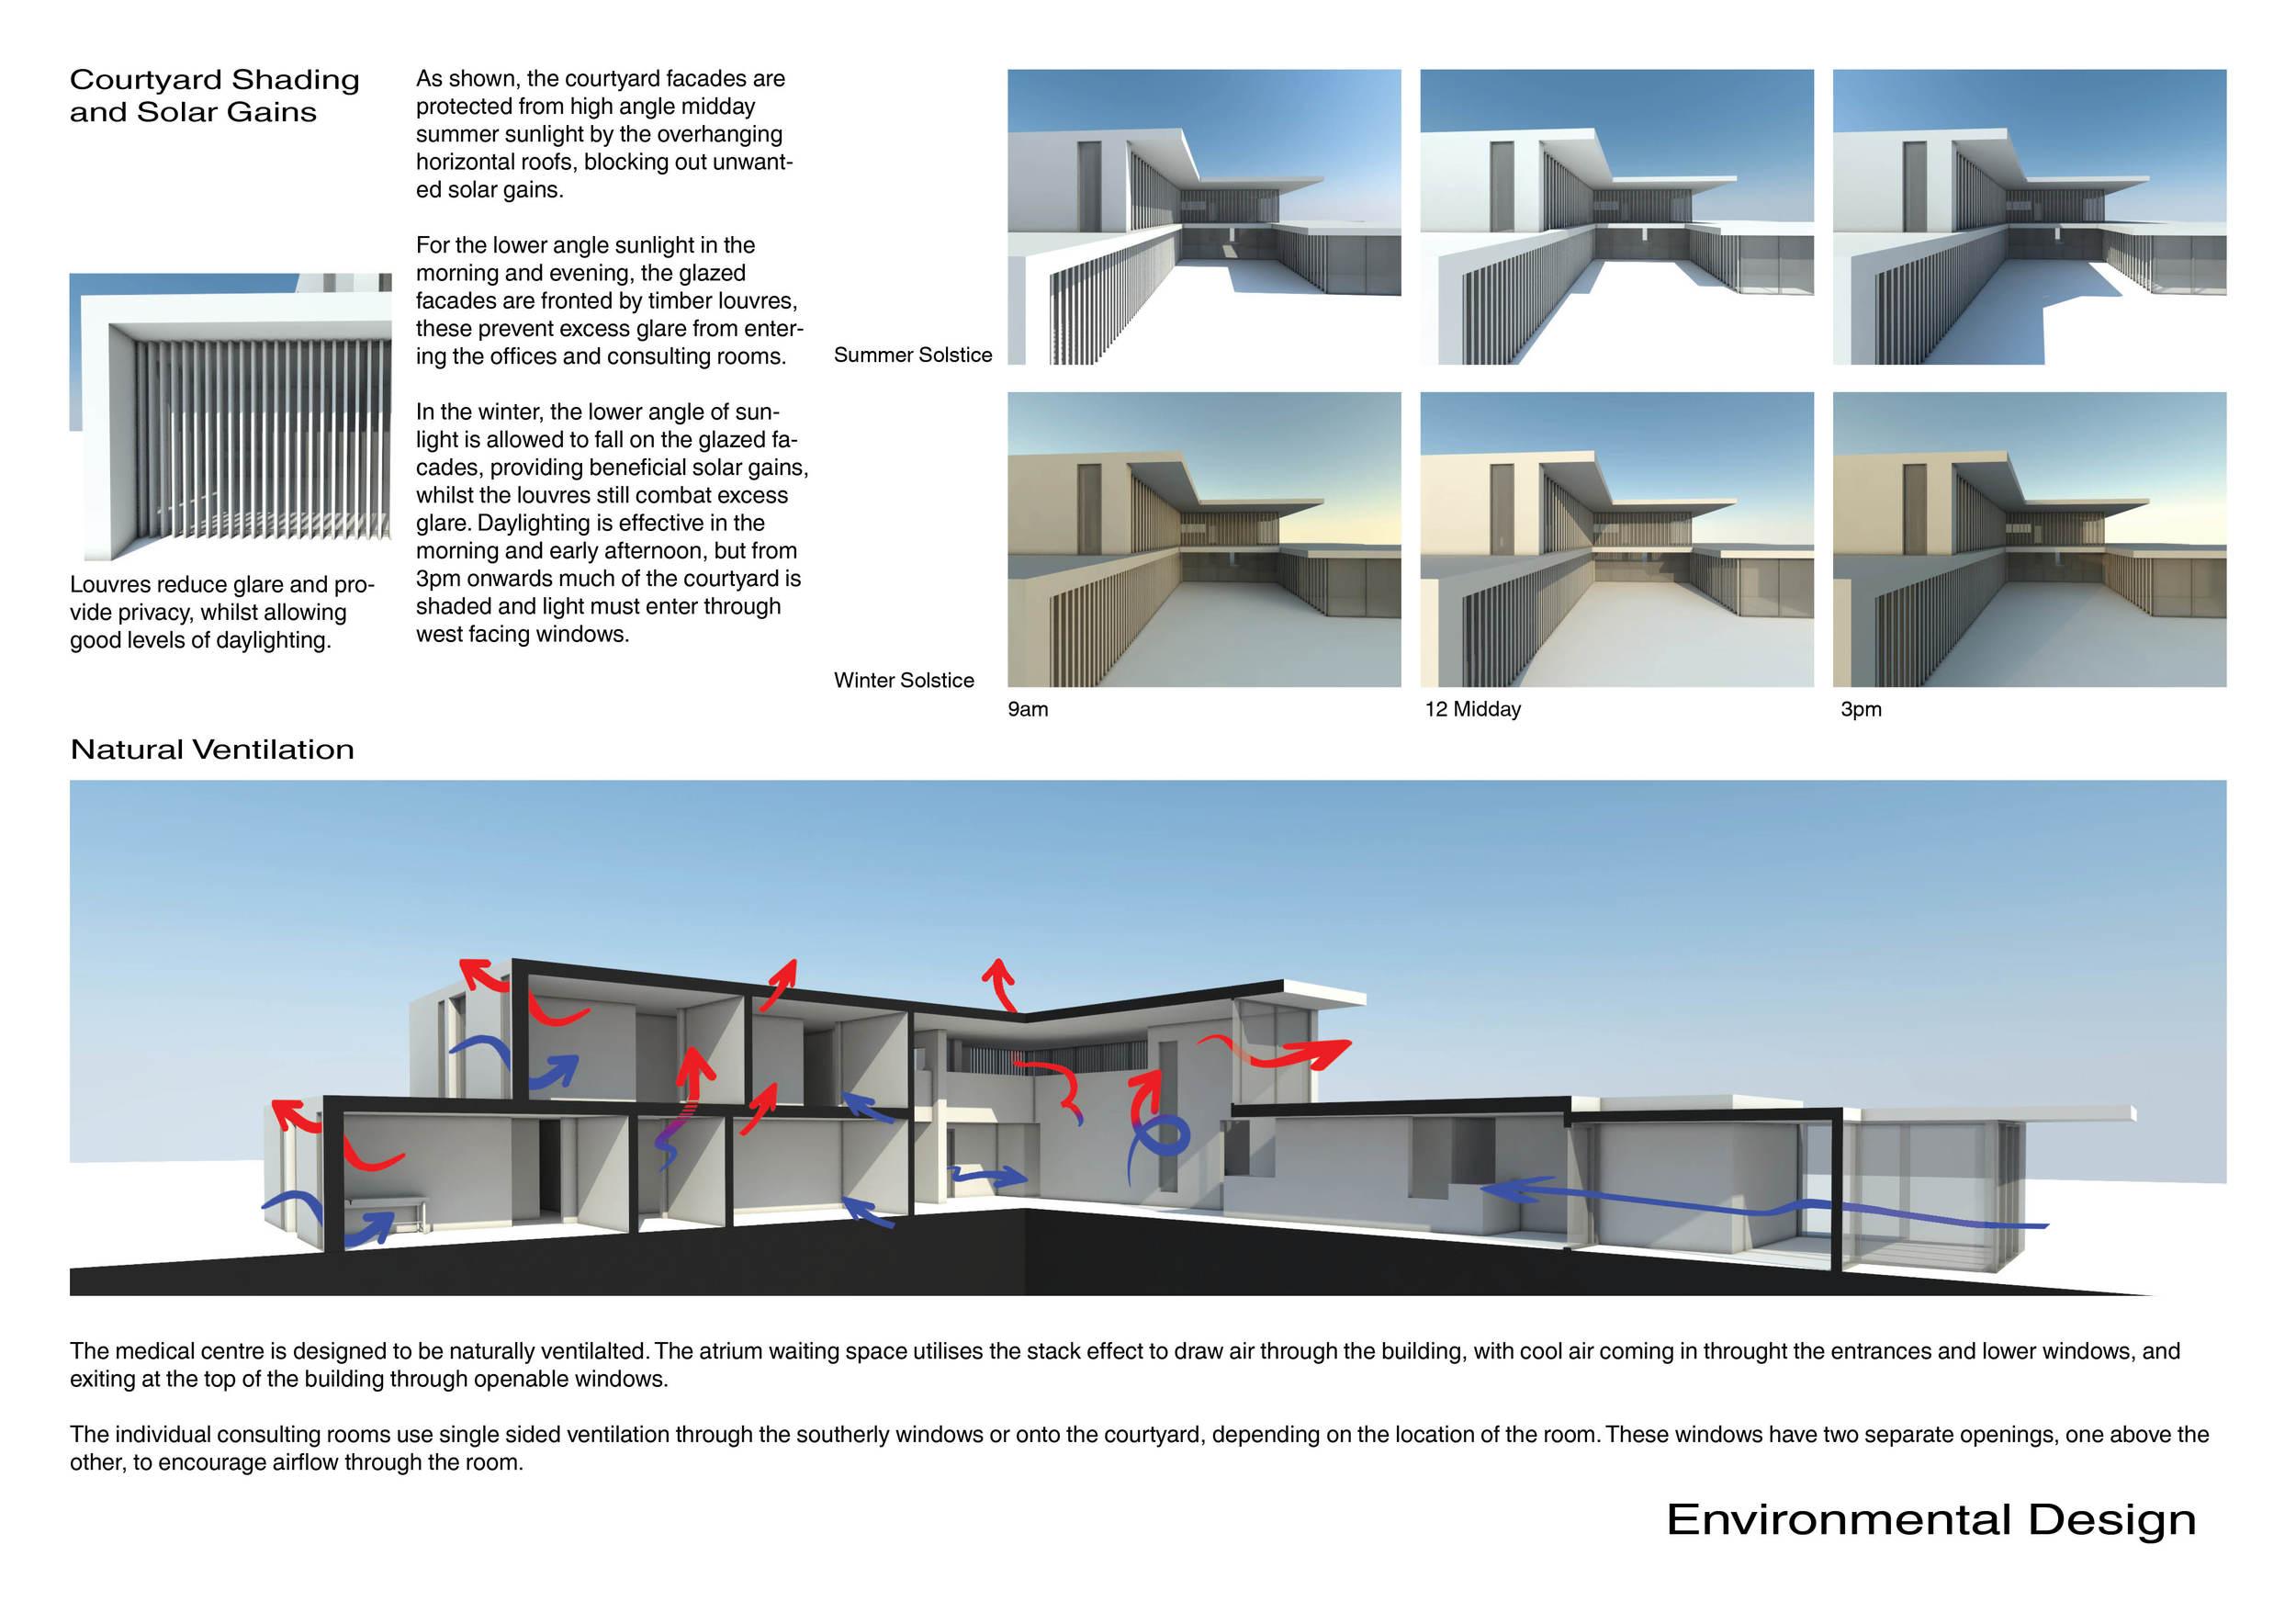 environmental design 2.jpg